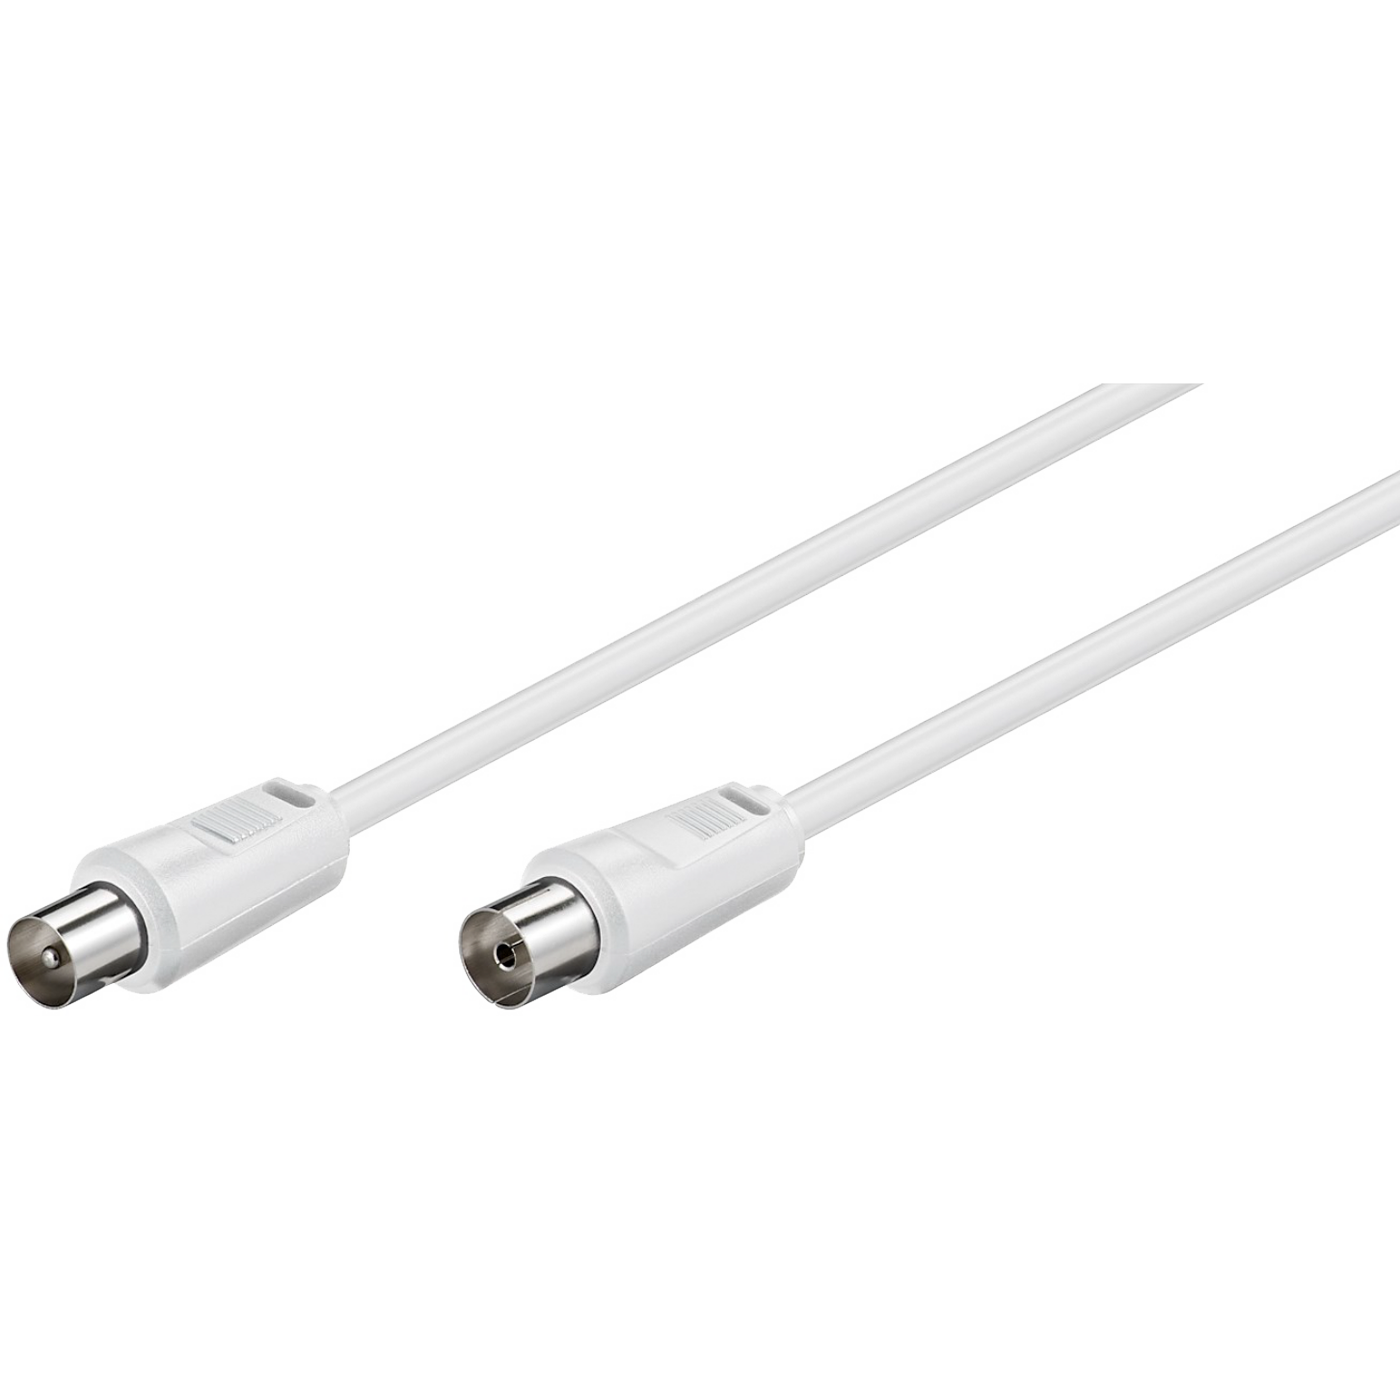 Antenski kabl sa RF - konektorima, 2.5 met